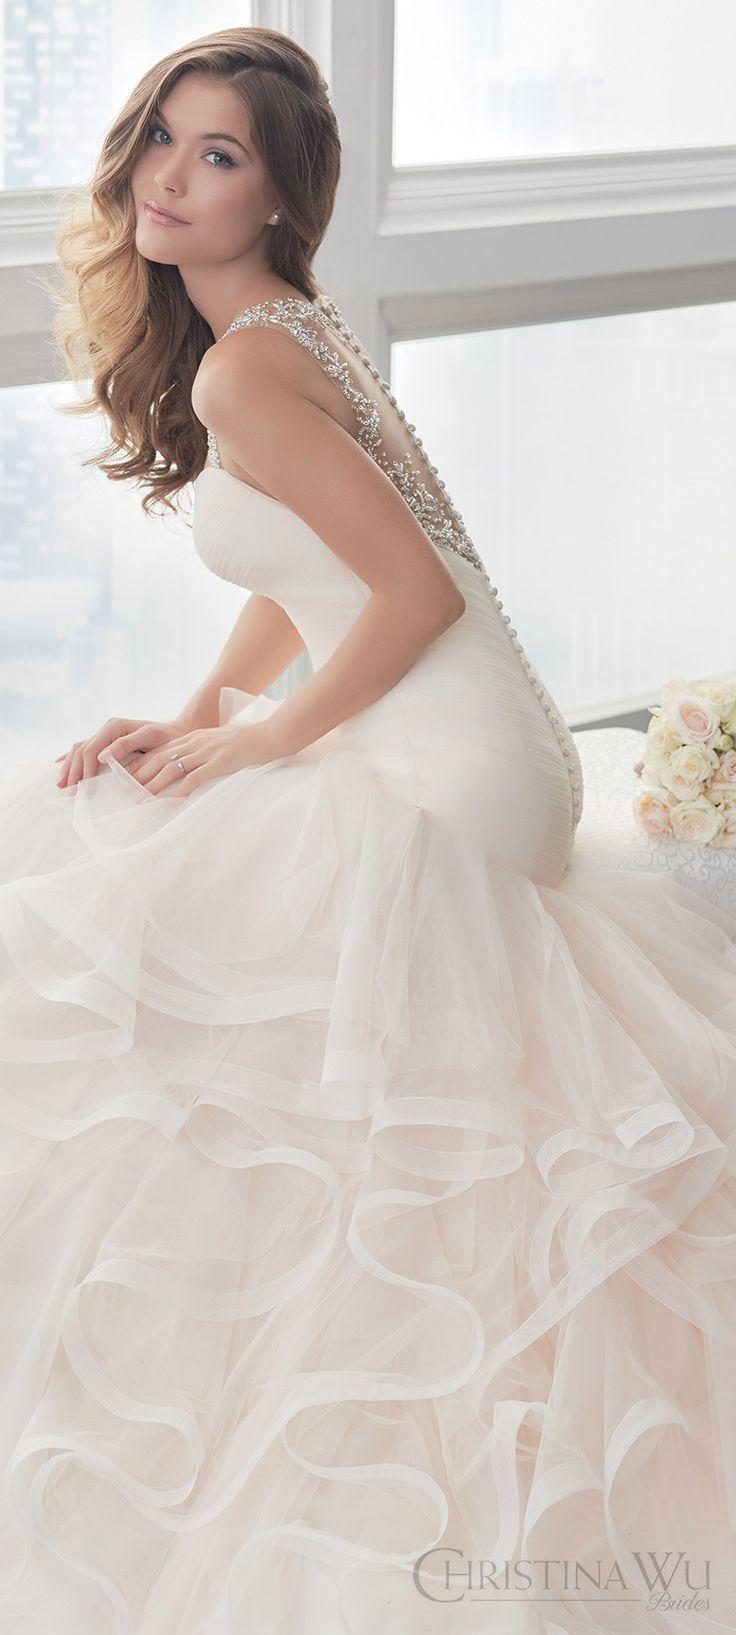 824 best princess wedding gown images on pinterest | wedding